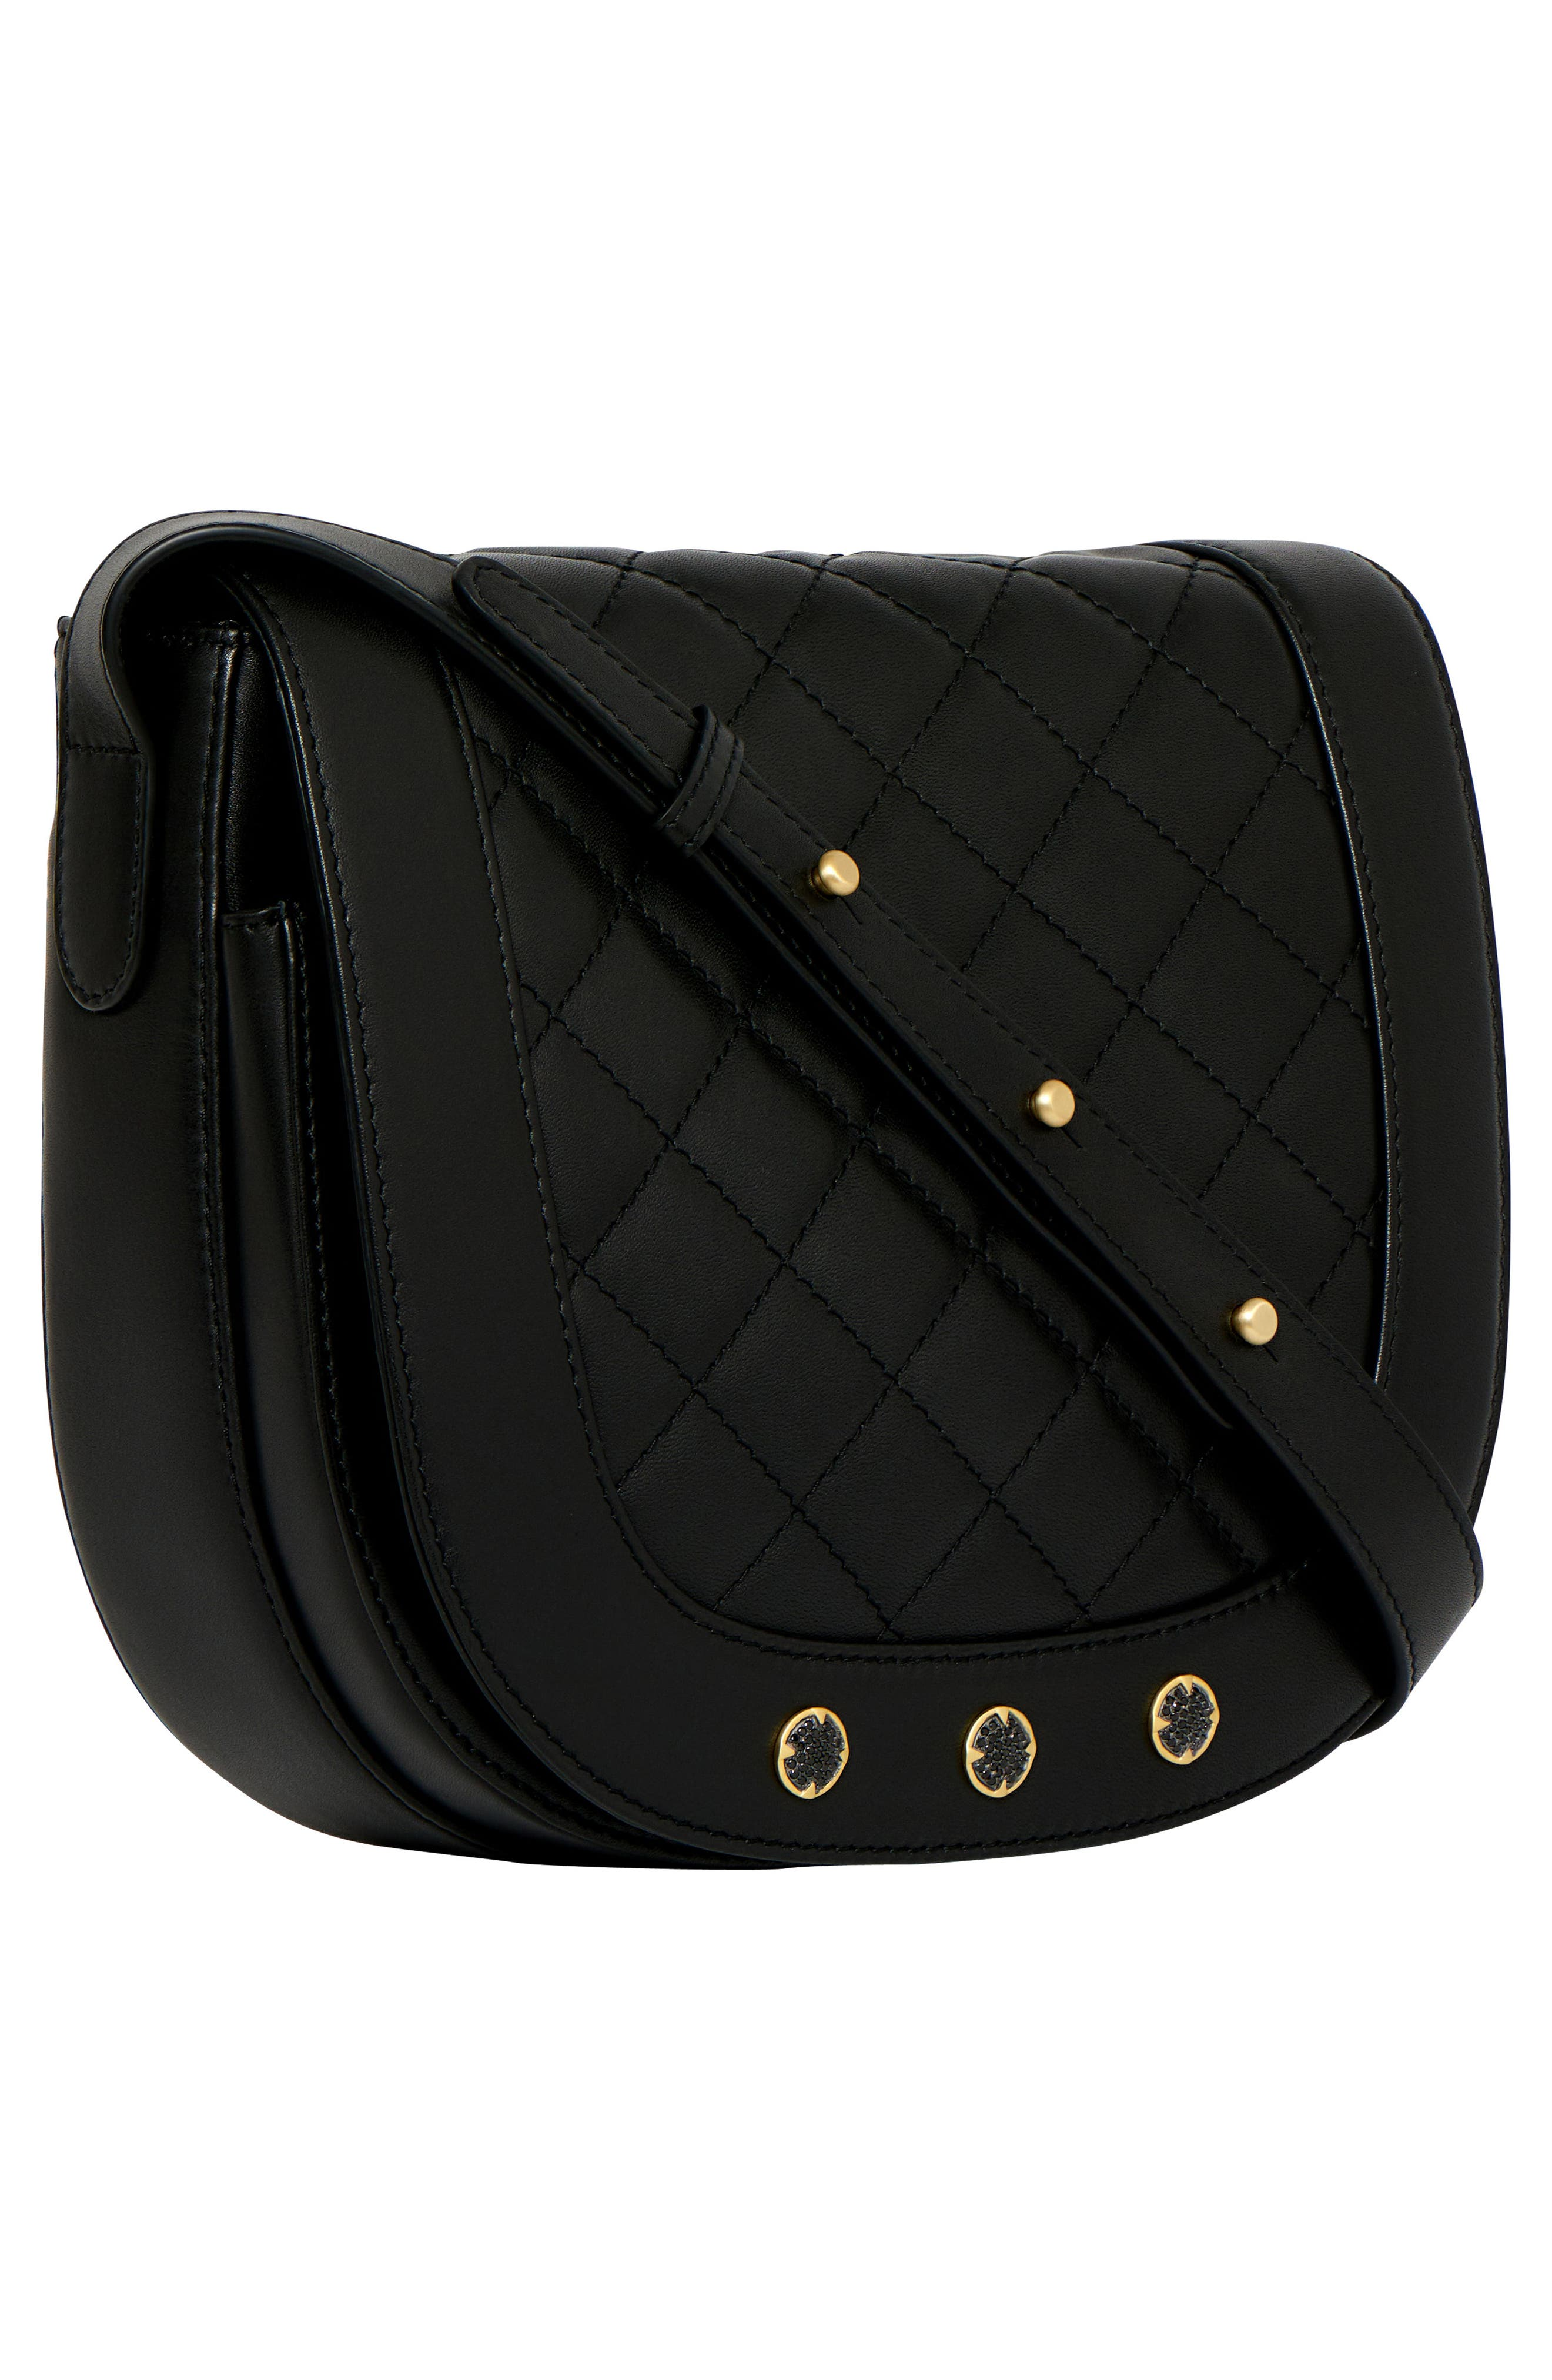 Bleeker Quilted Leather Messenger Bag,                             Alternate thumbnail 4, color,                             Black